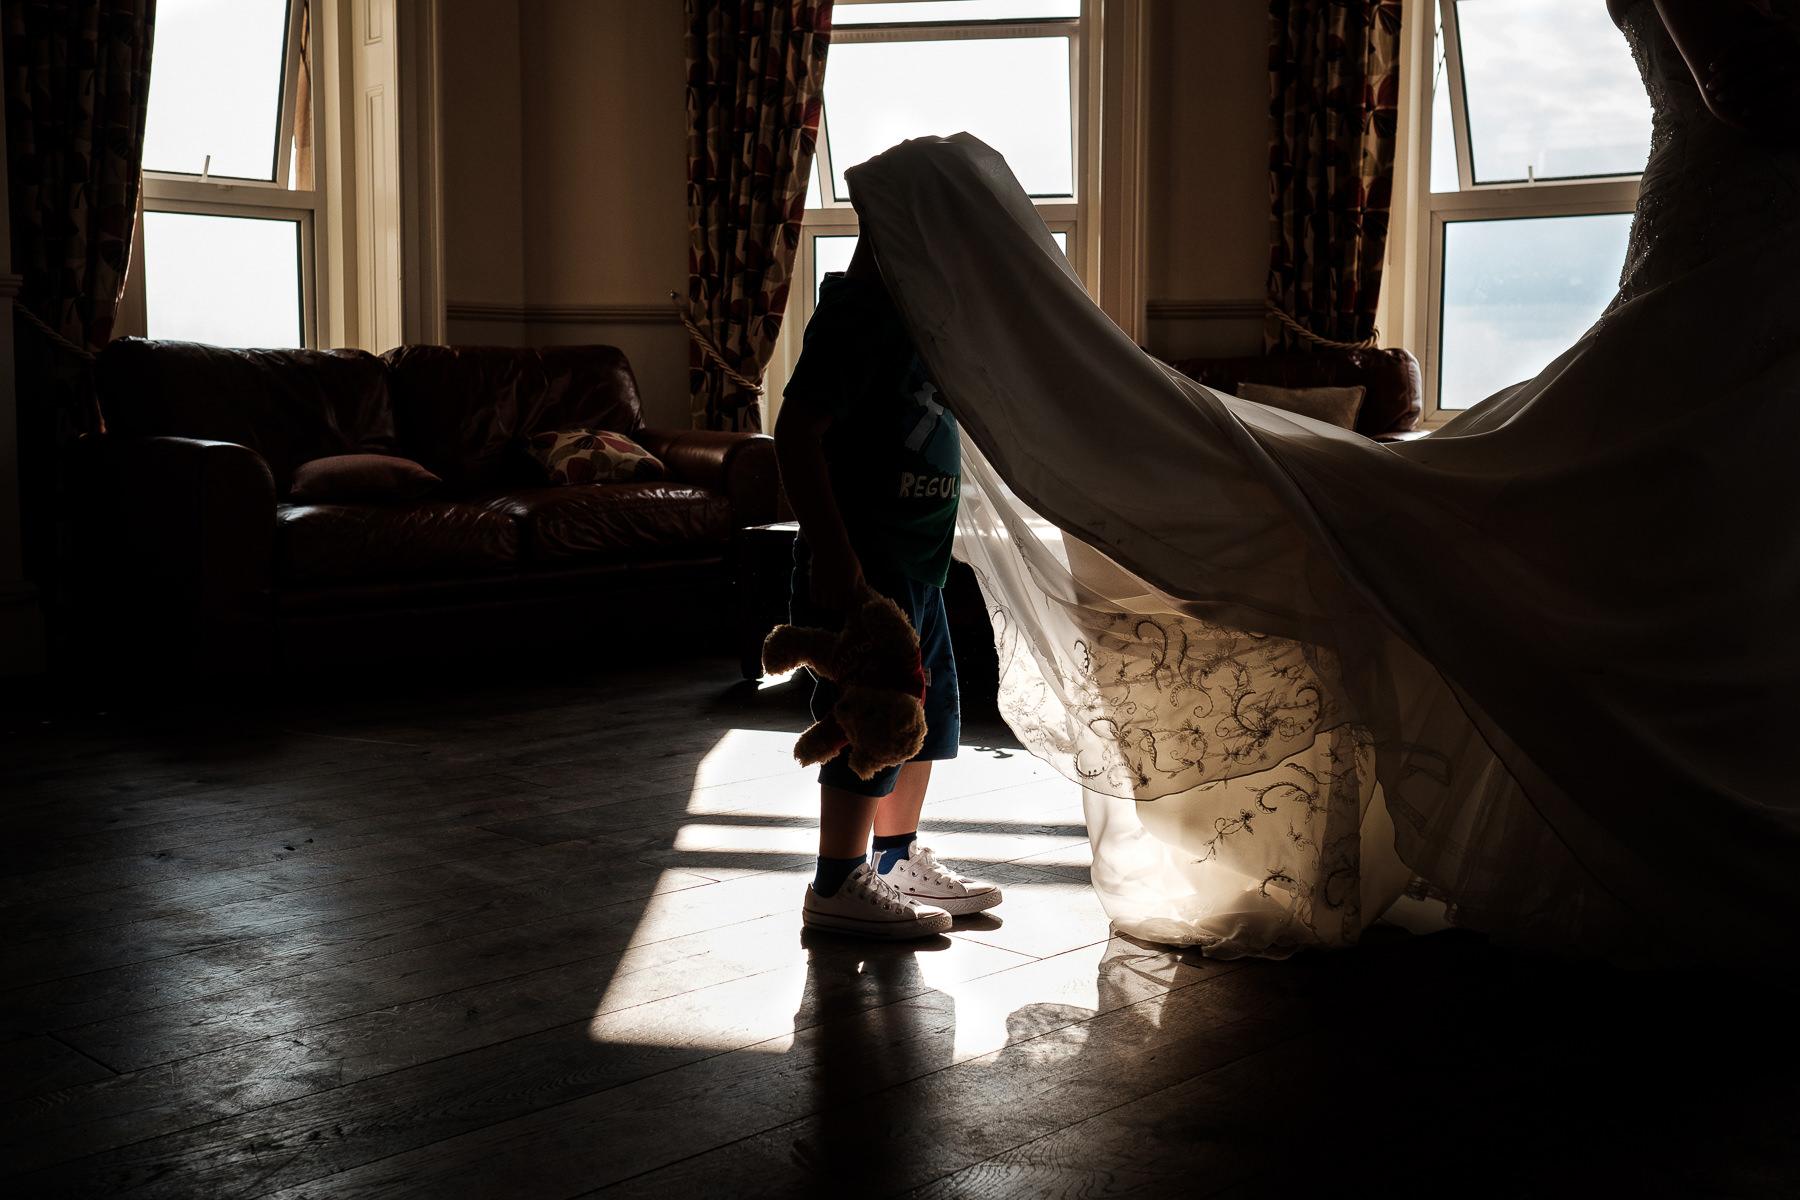 walton park clevedon boy with head under wedding dress